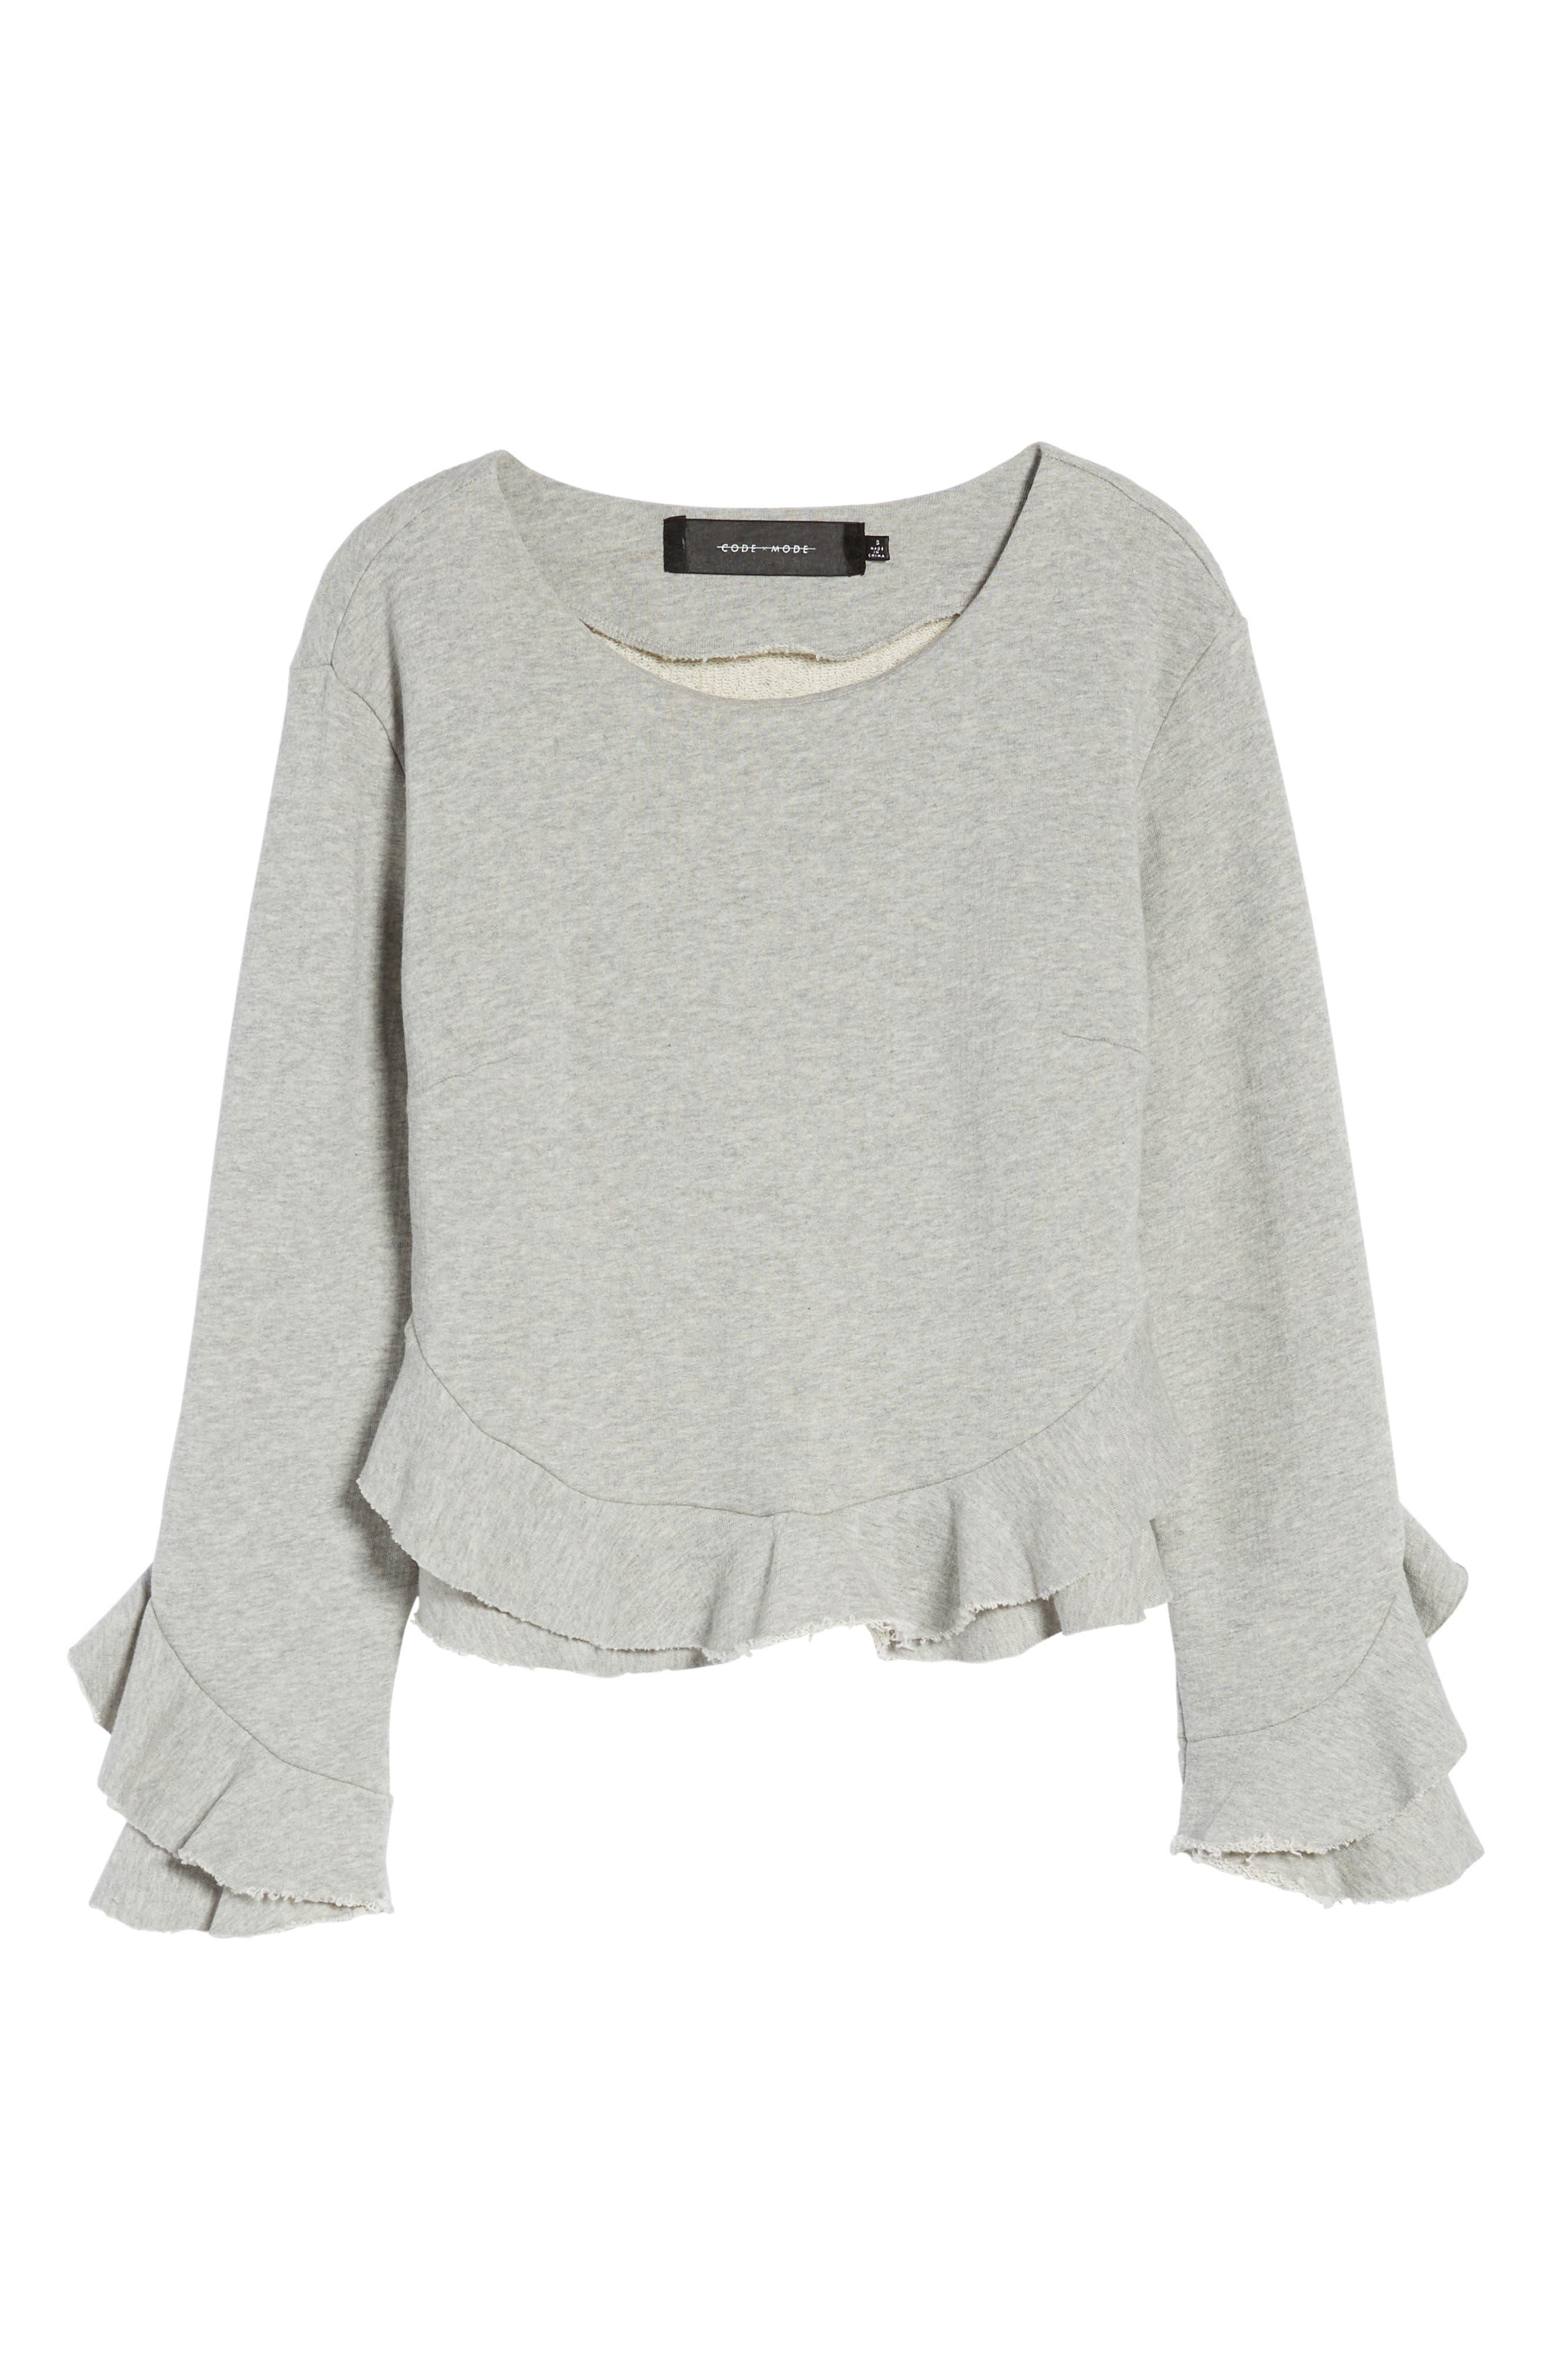 Ruffle Trim Sweatshirt,                             Alternate thumbnail 6, color,                             Heather Grey